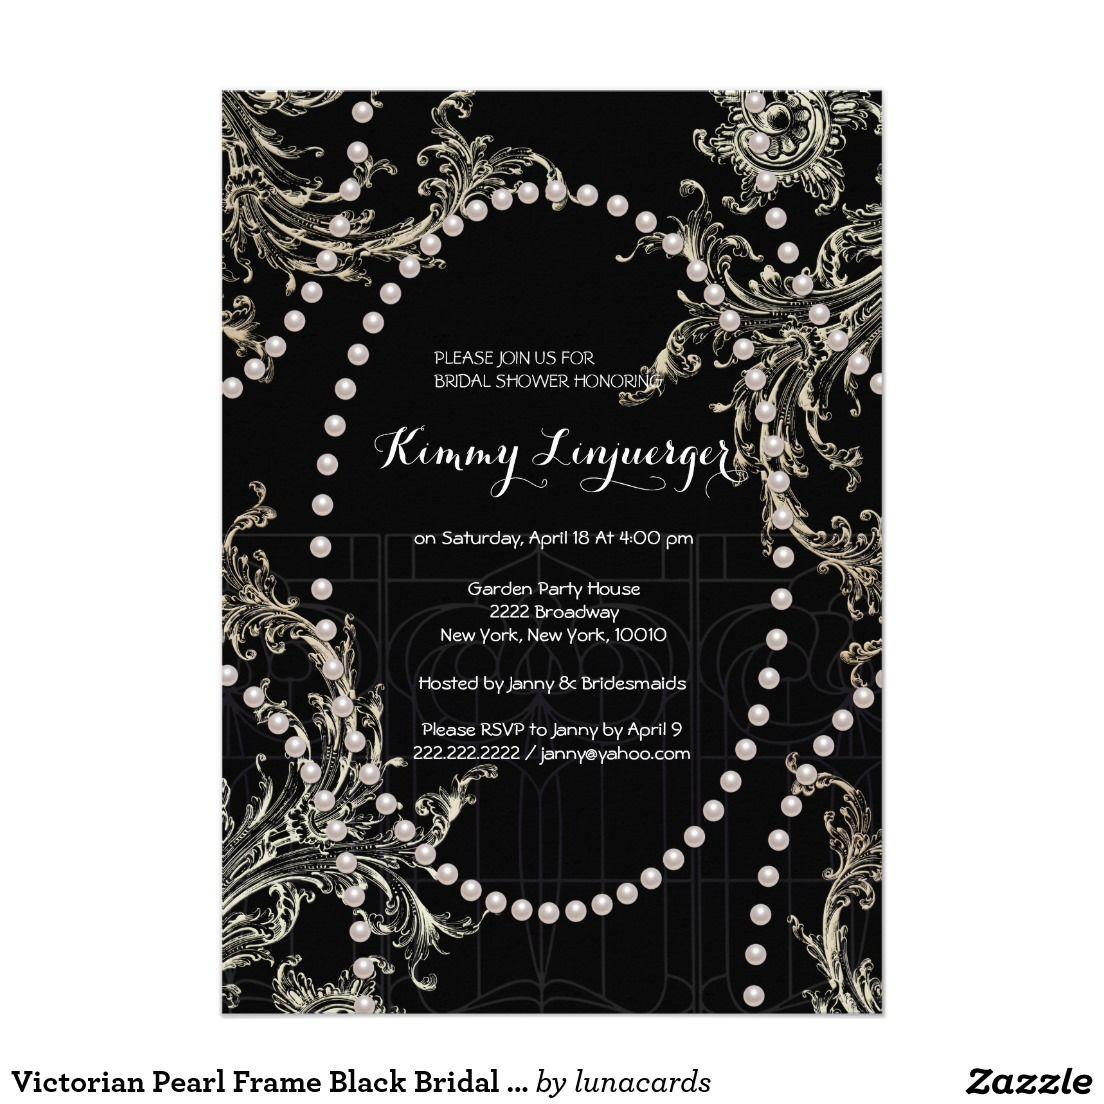 Victorian Pearl Frame Black Bridal Shower | VICTORIAN WEDDING ...